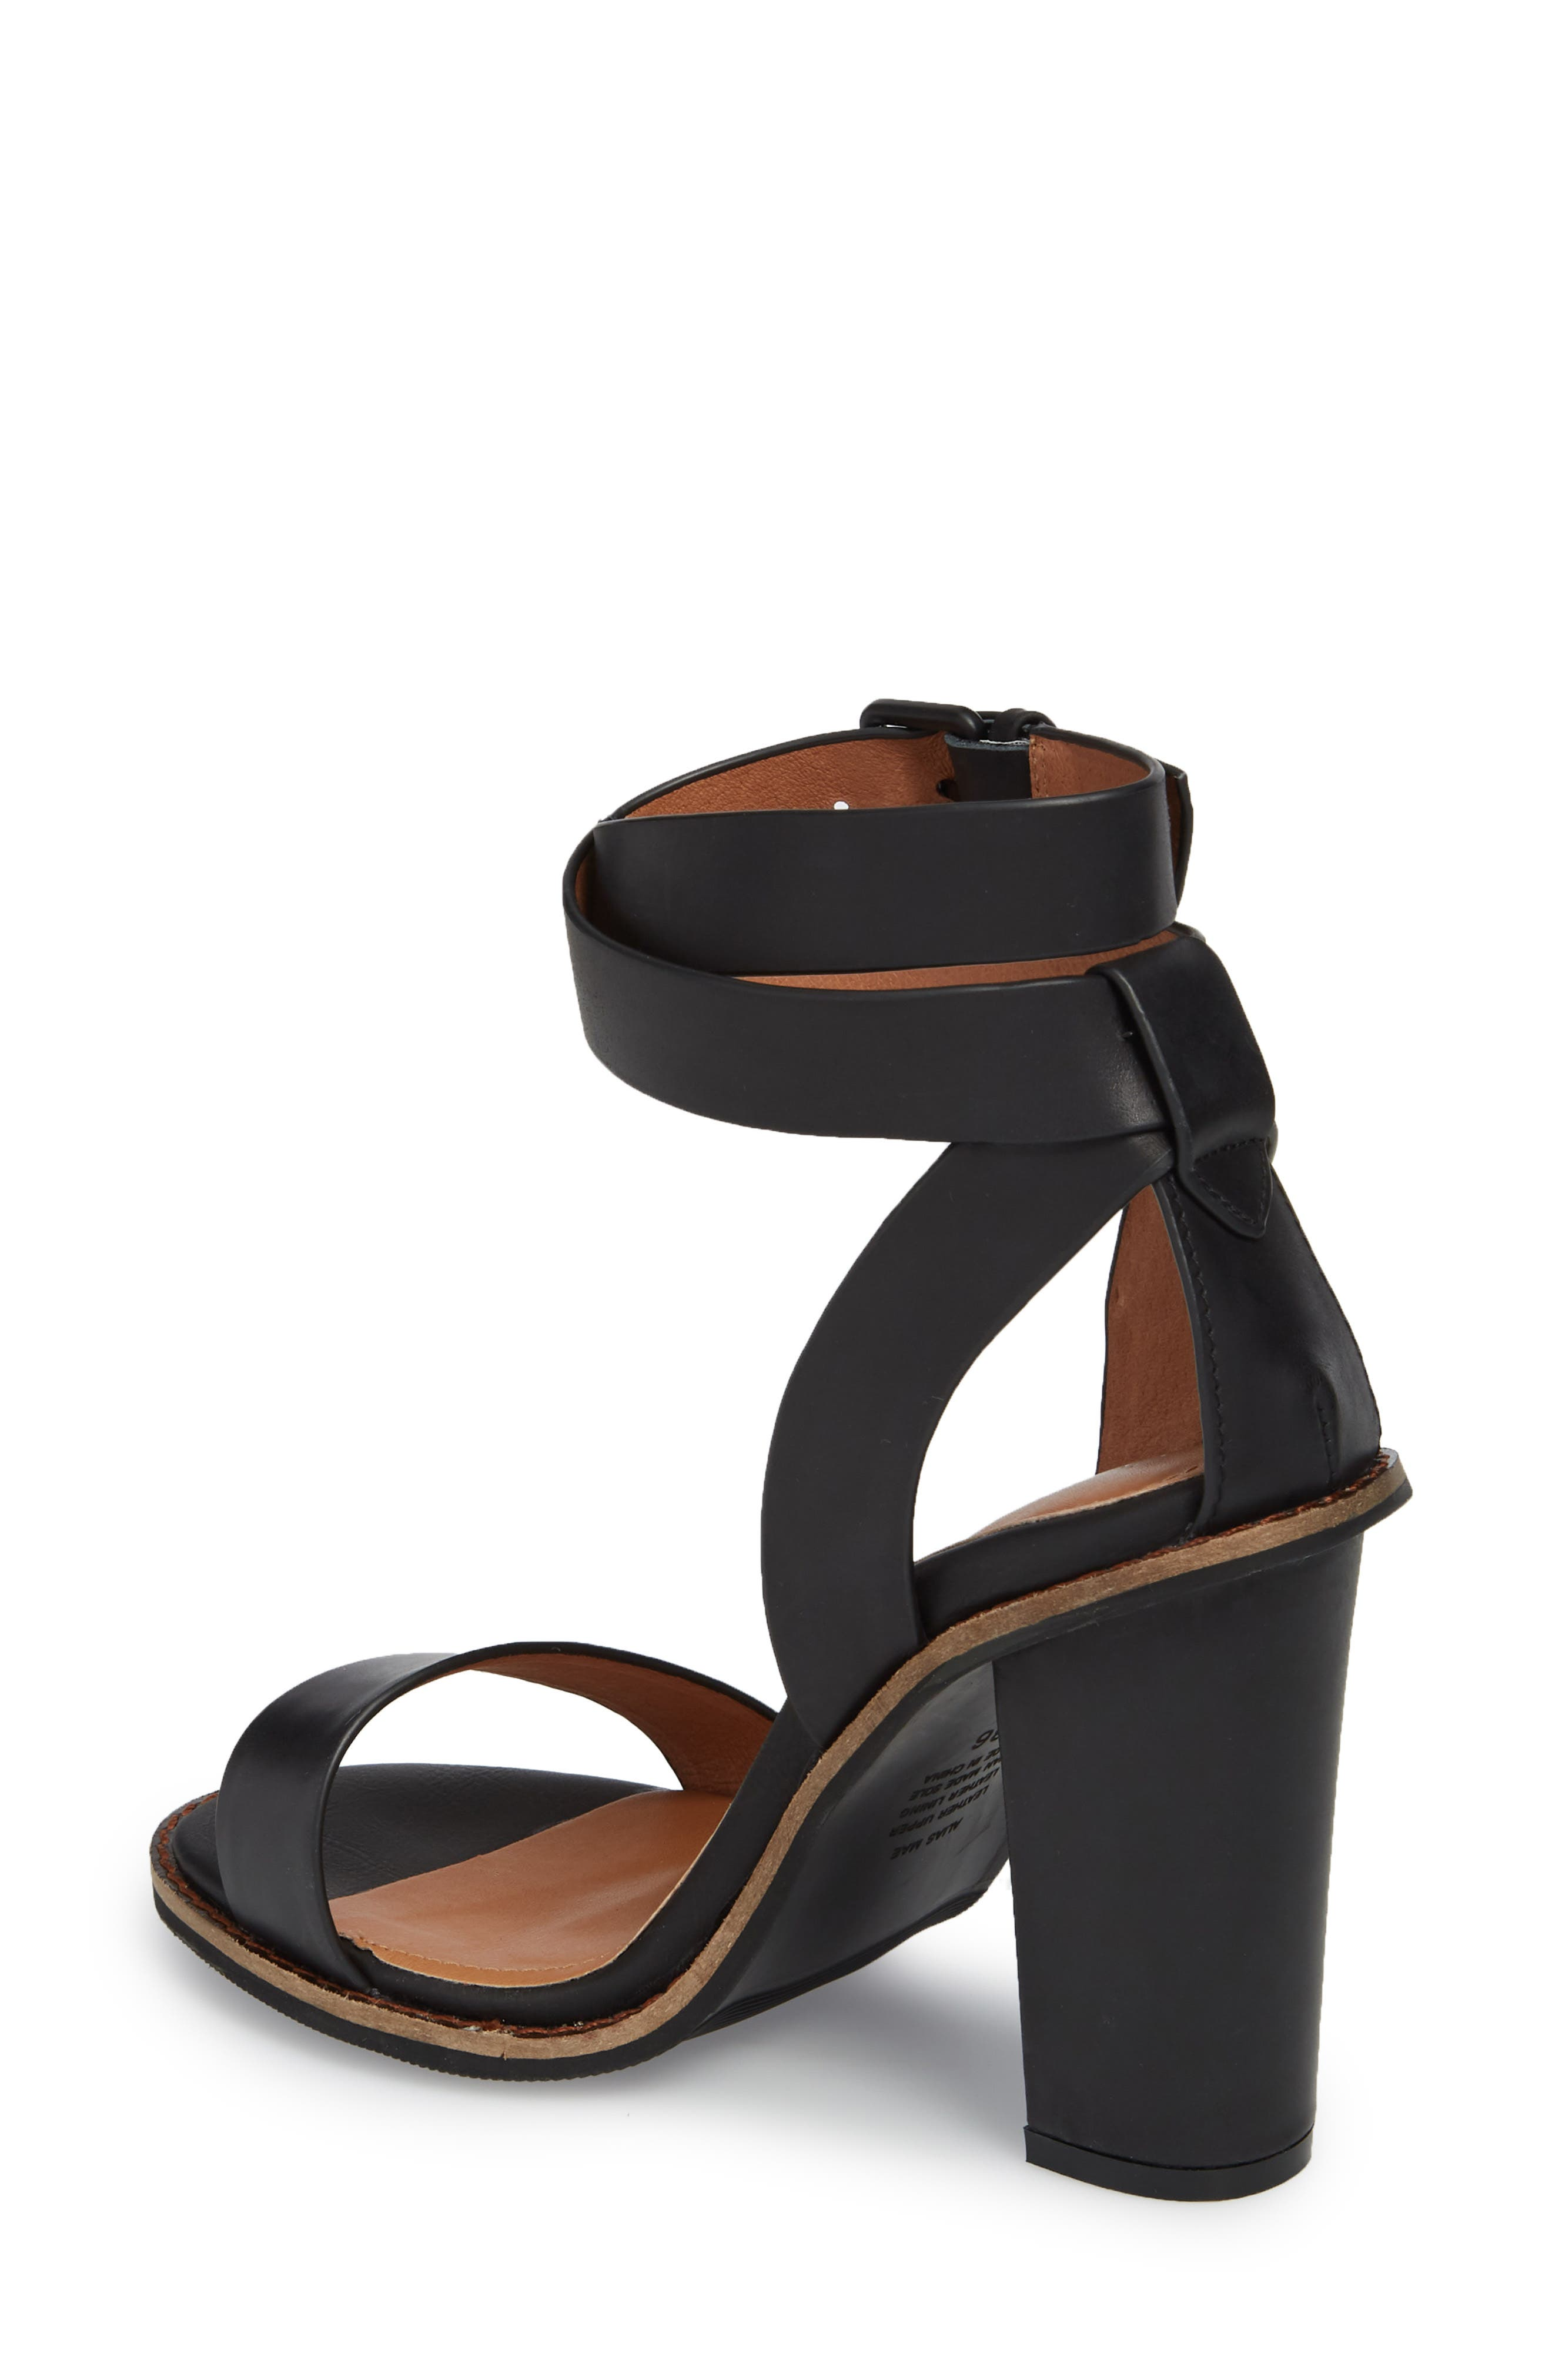 Calito Ankle Strap Sandal,                             Alternate thumbnail 2, color,                             001